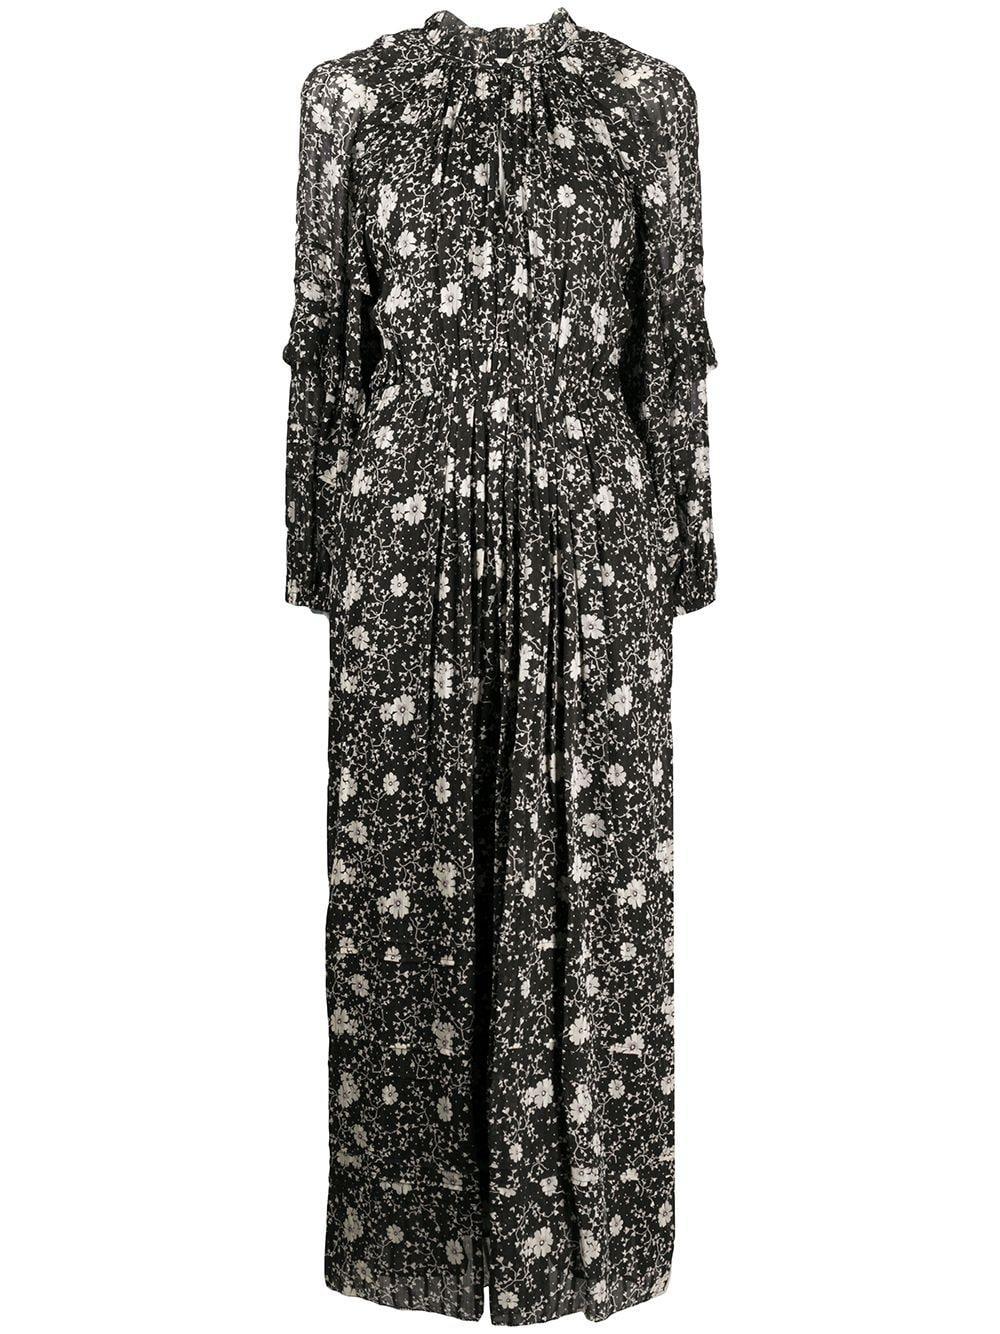 Long Sleeve Floral Print Maxi Dress Item # ESTINE